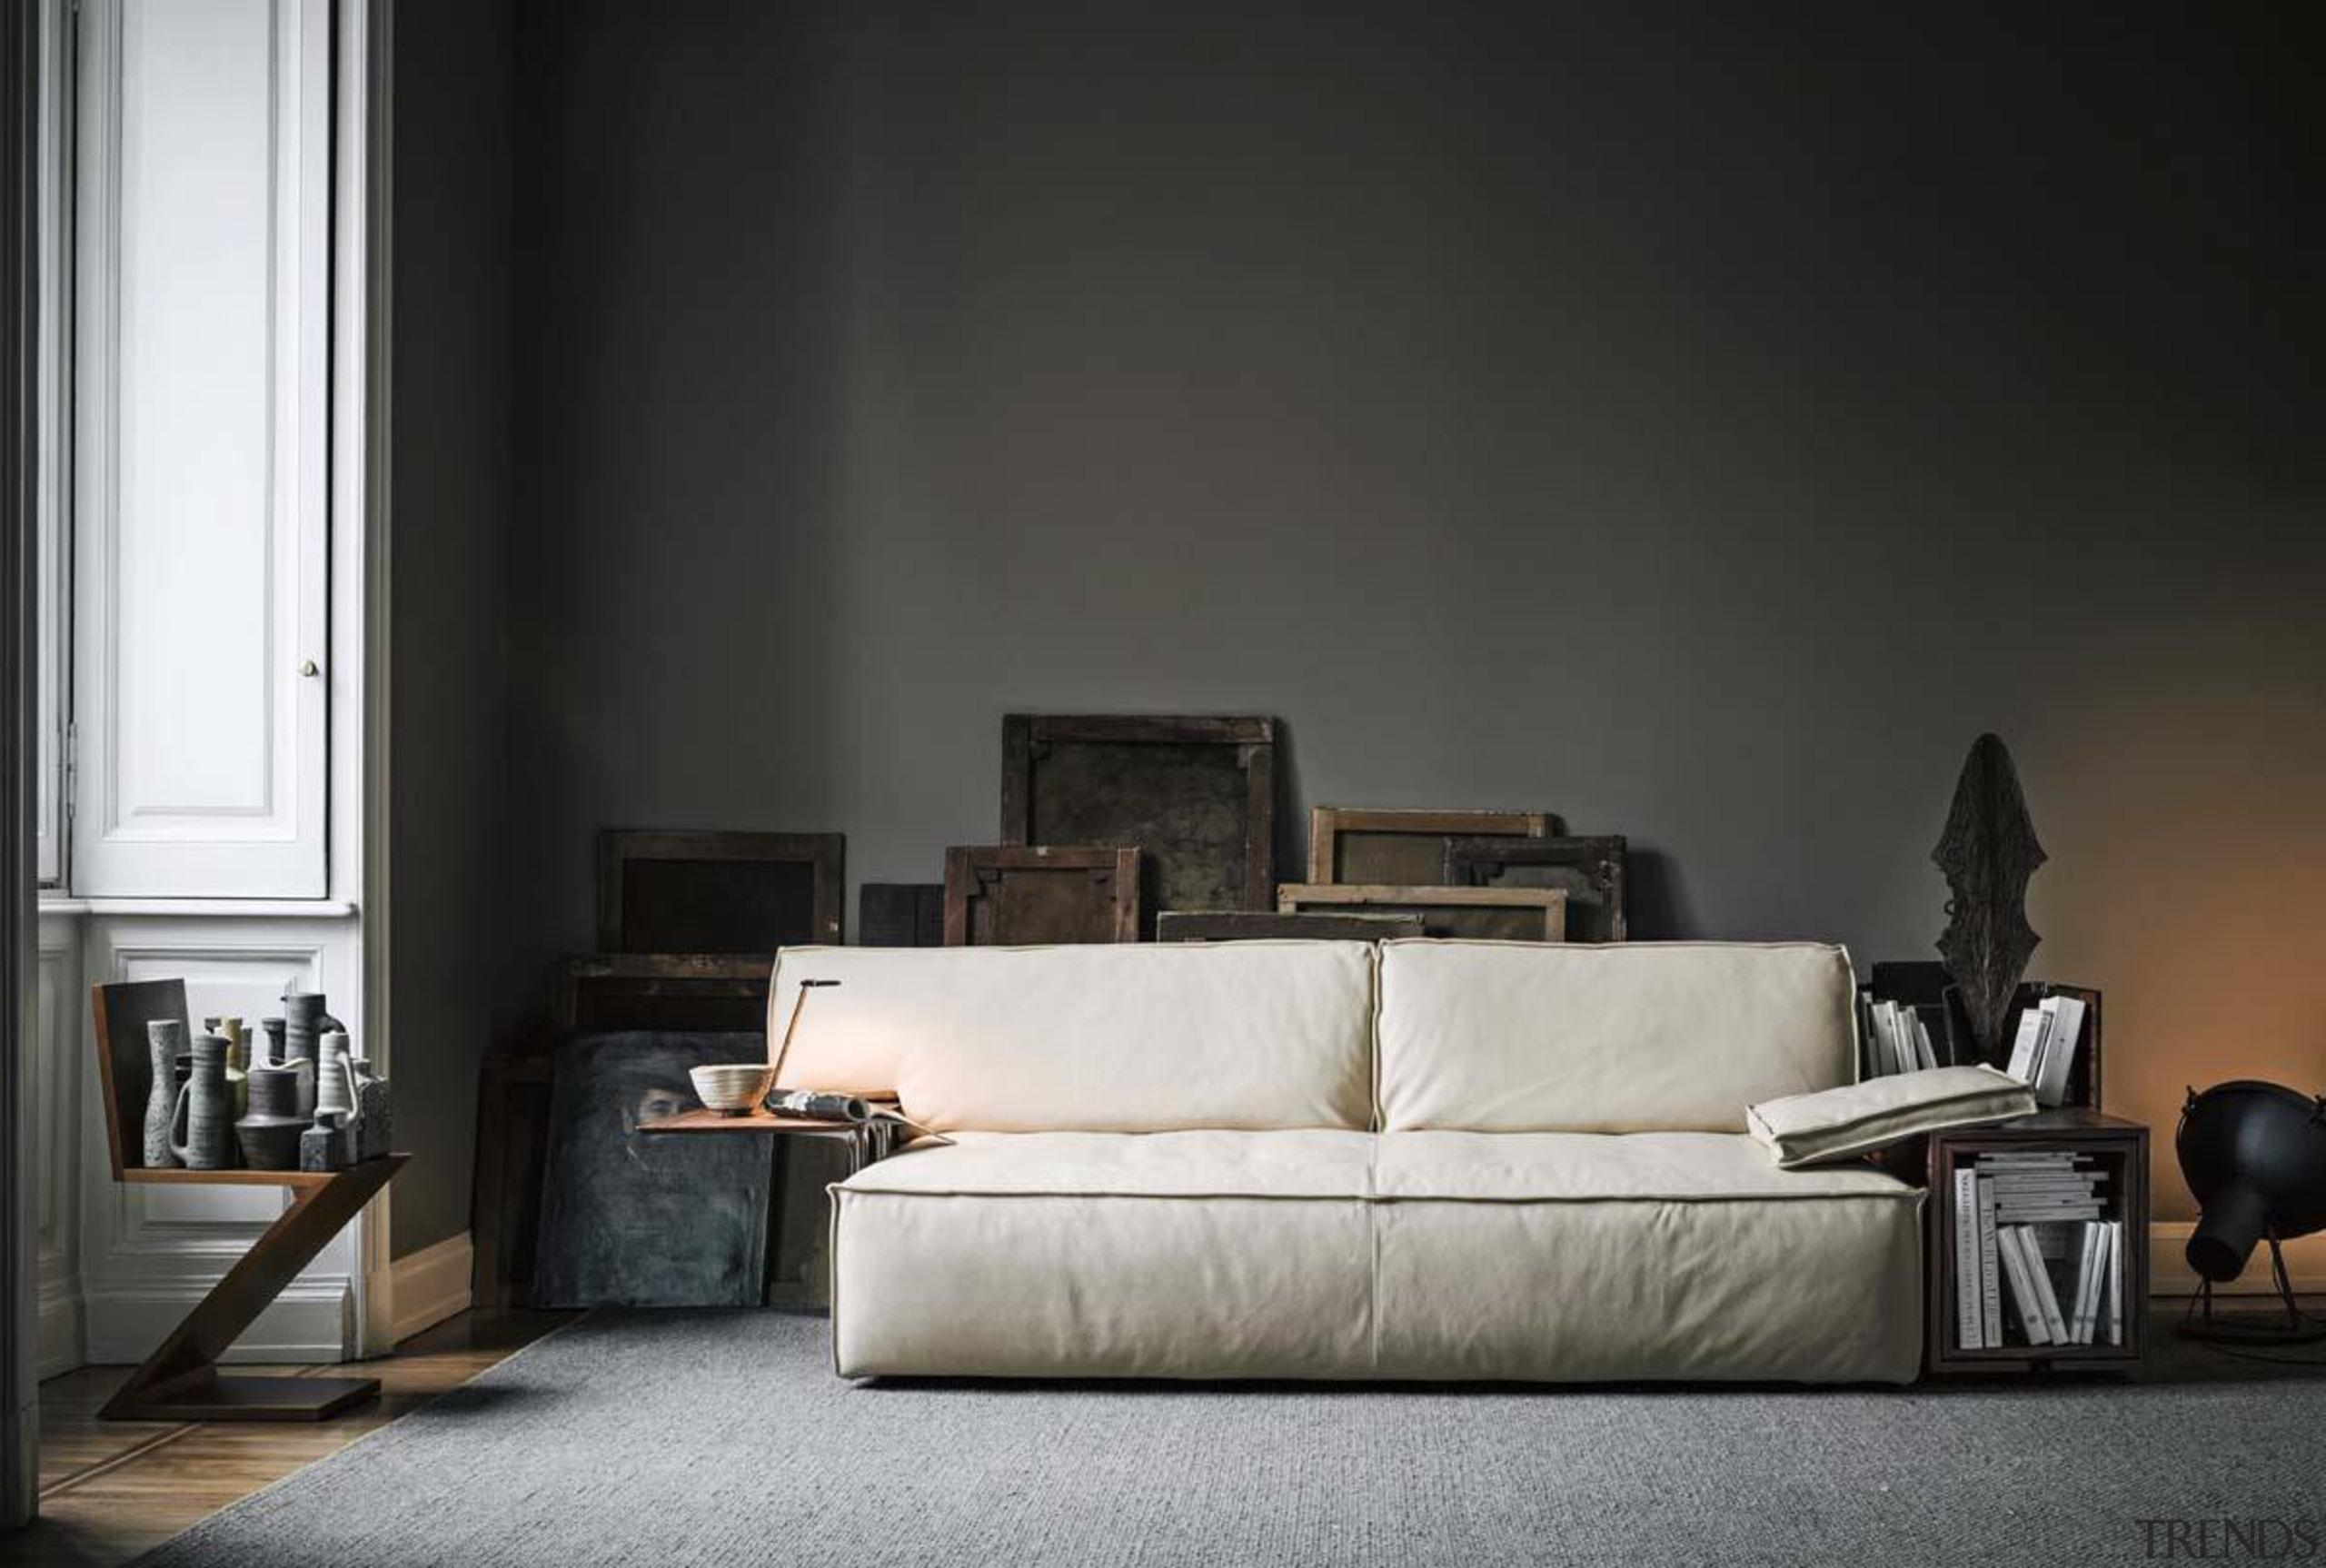 cassinastarckmyworldsofainstu4.jpg - cassinastarckmyworldsofainstu4.jpg - angle | chair | angle, chair, couch, floor, furniture, home, interior design, living room, product design, room, sofa bed, table, wall, black